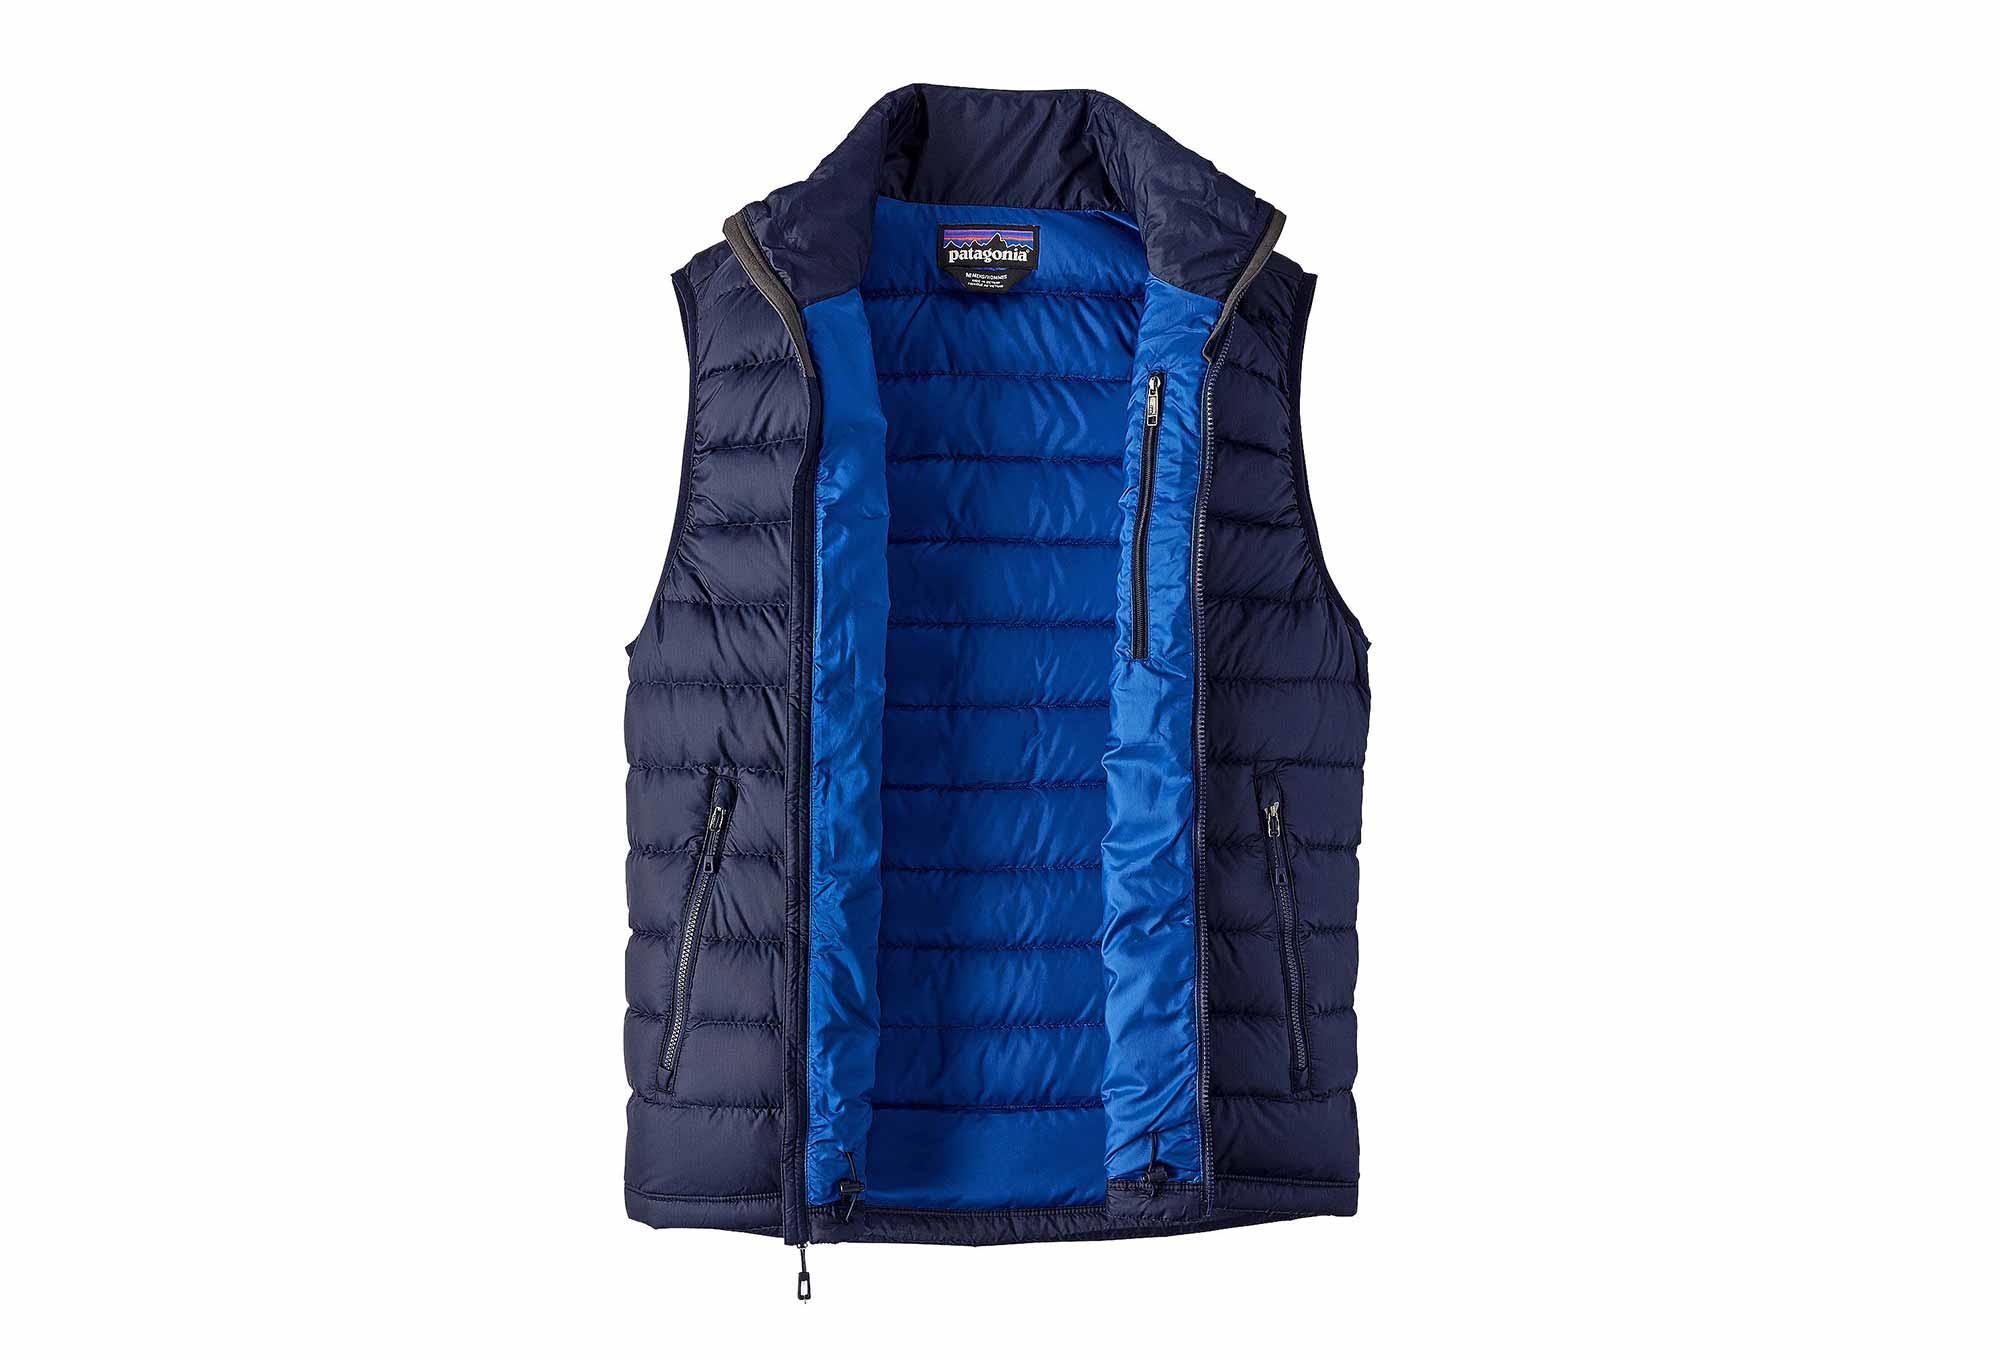 4c57096ab33 Doudoune sans Manches Patagonia Sweater Bleu Marine